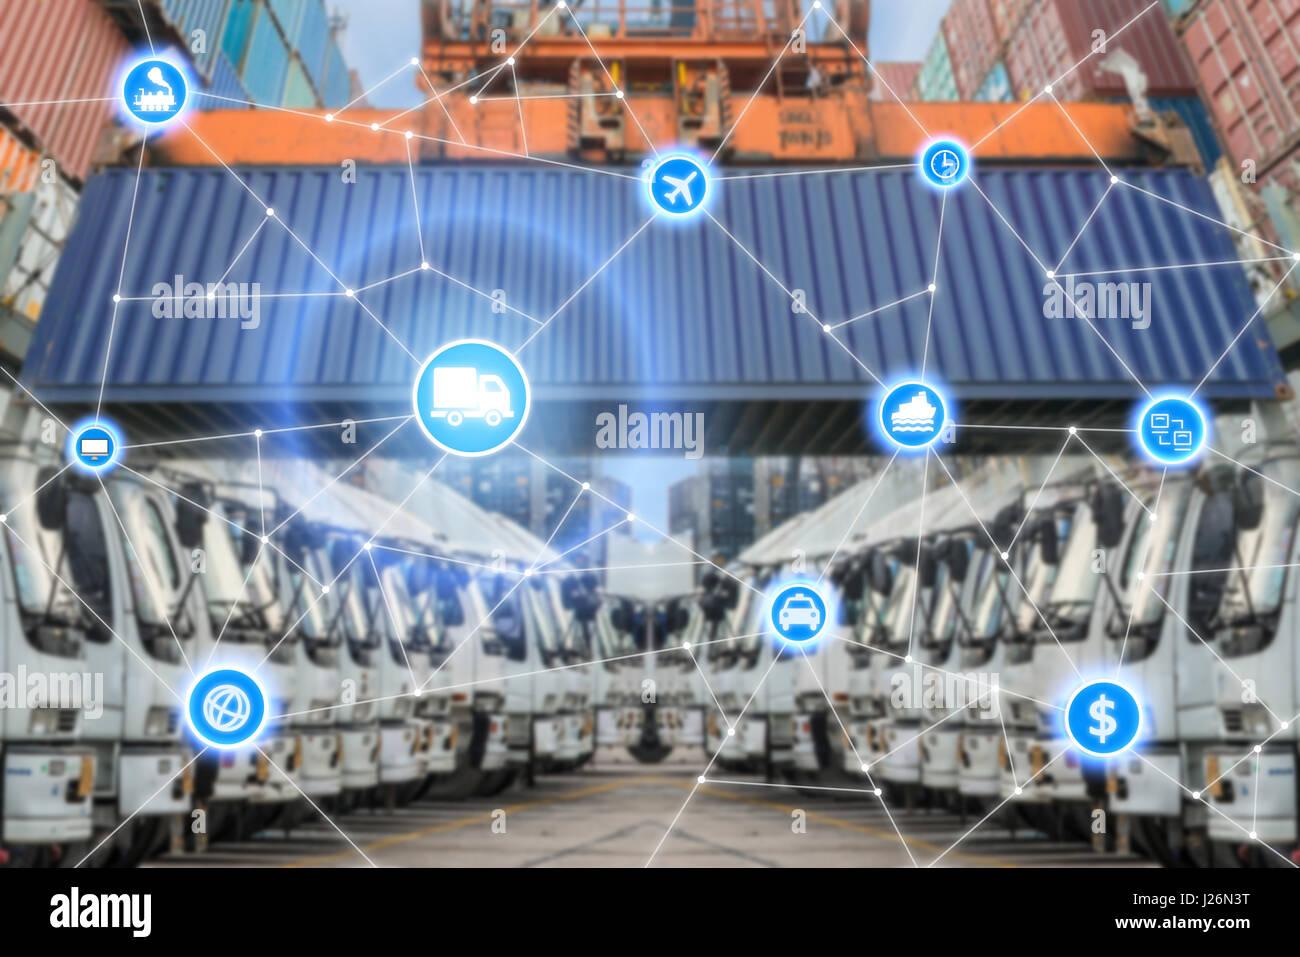 Global business logistics system collegamento interfaccia tecnologia global partner connection Immagini Stock